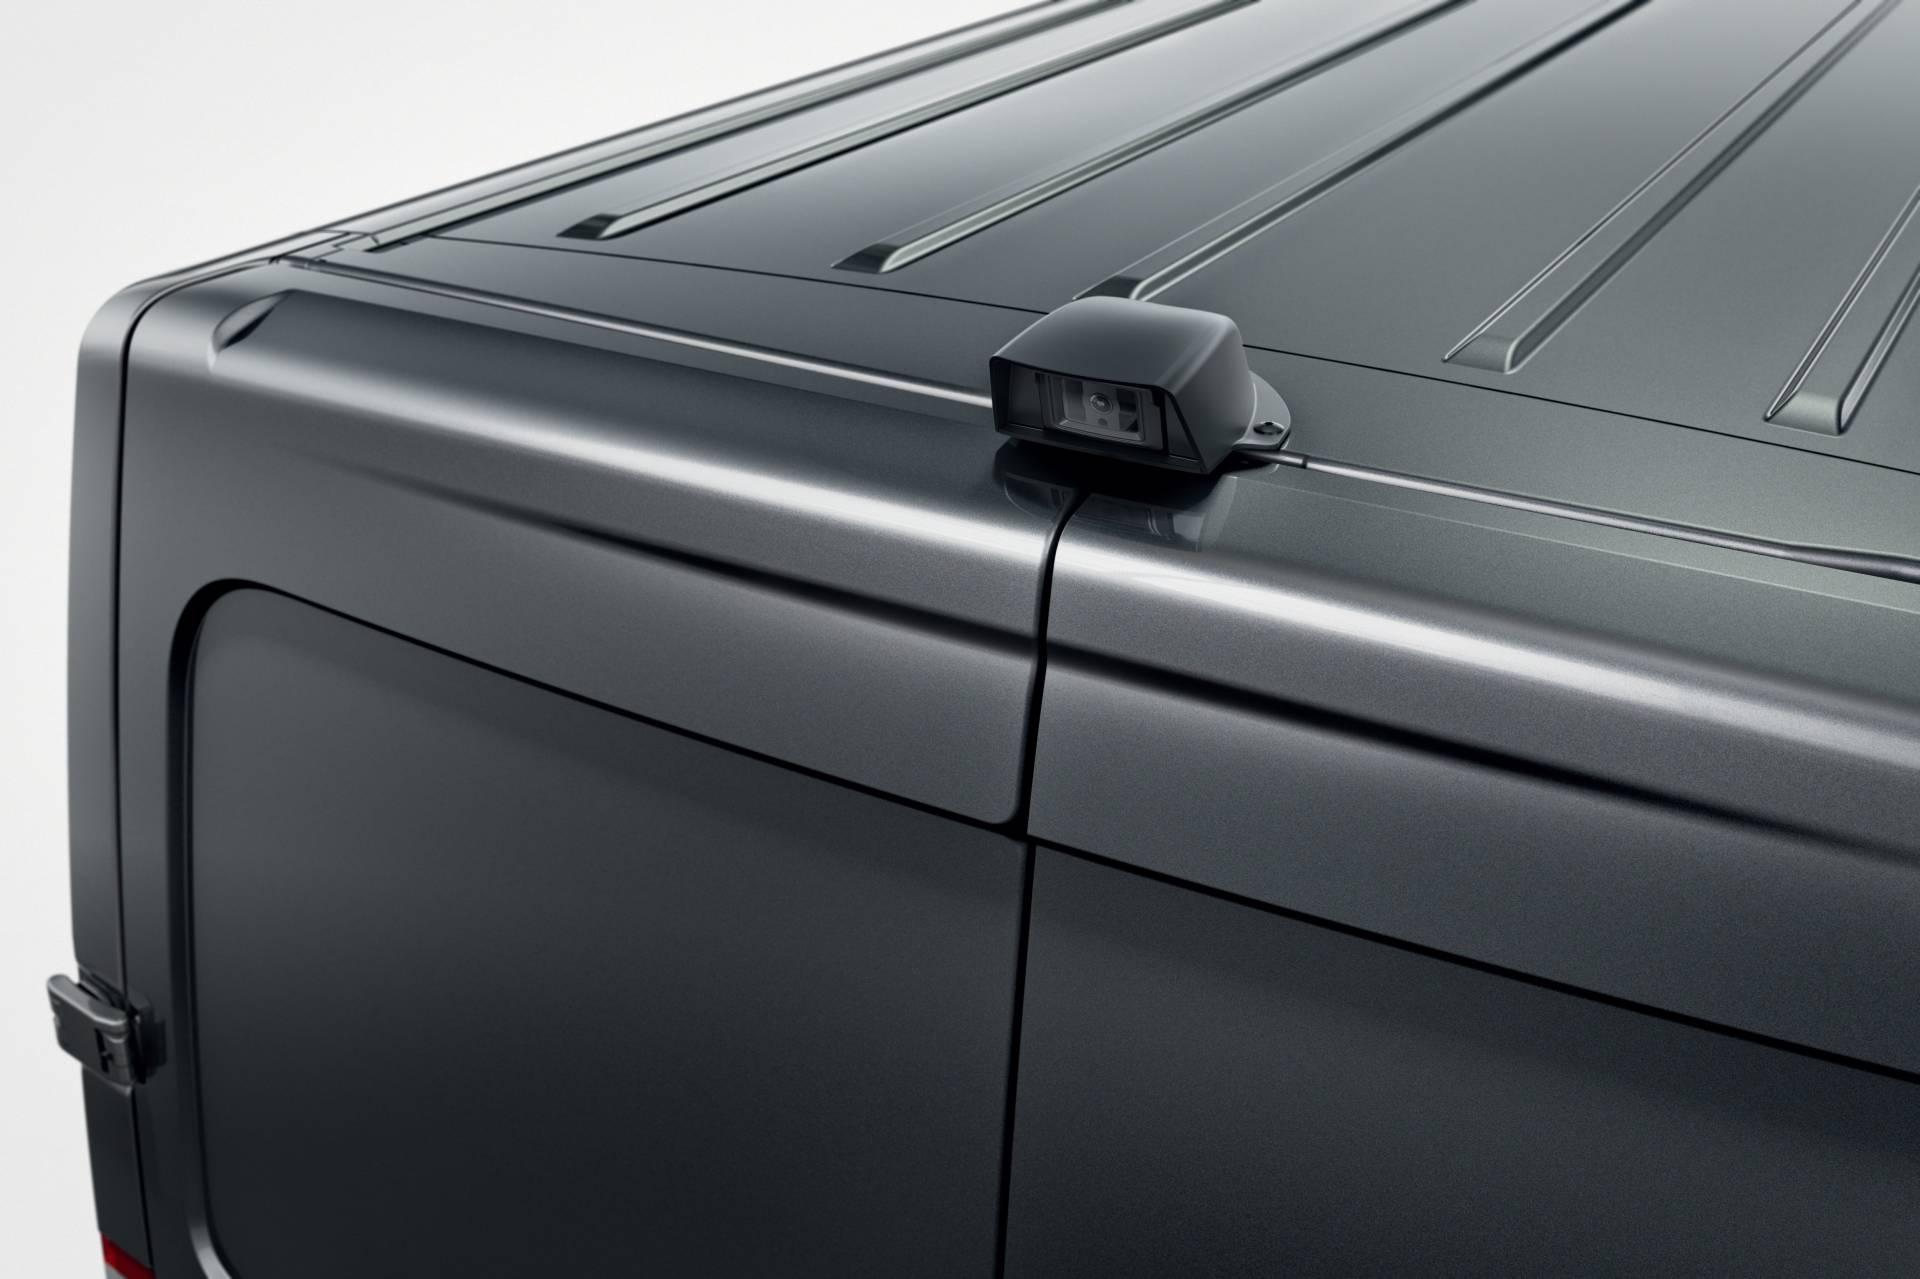 1ee30650-2019my-renault-master-van-facelift-1